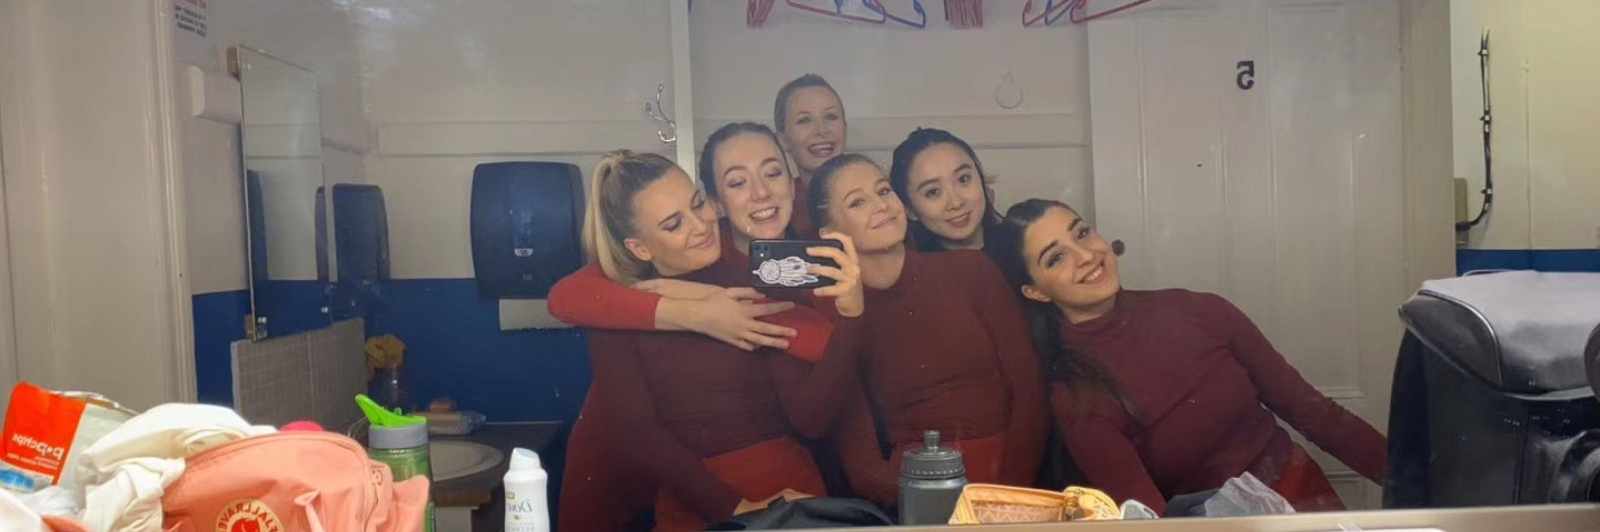 MA Dance Students at Salford